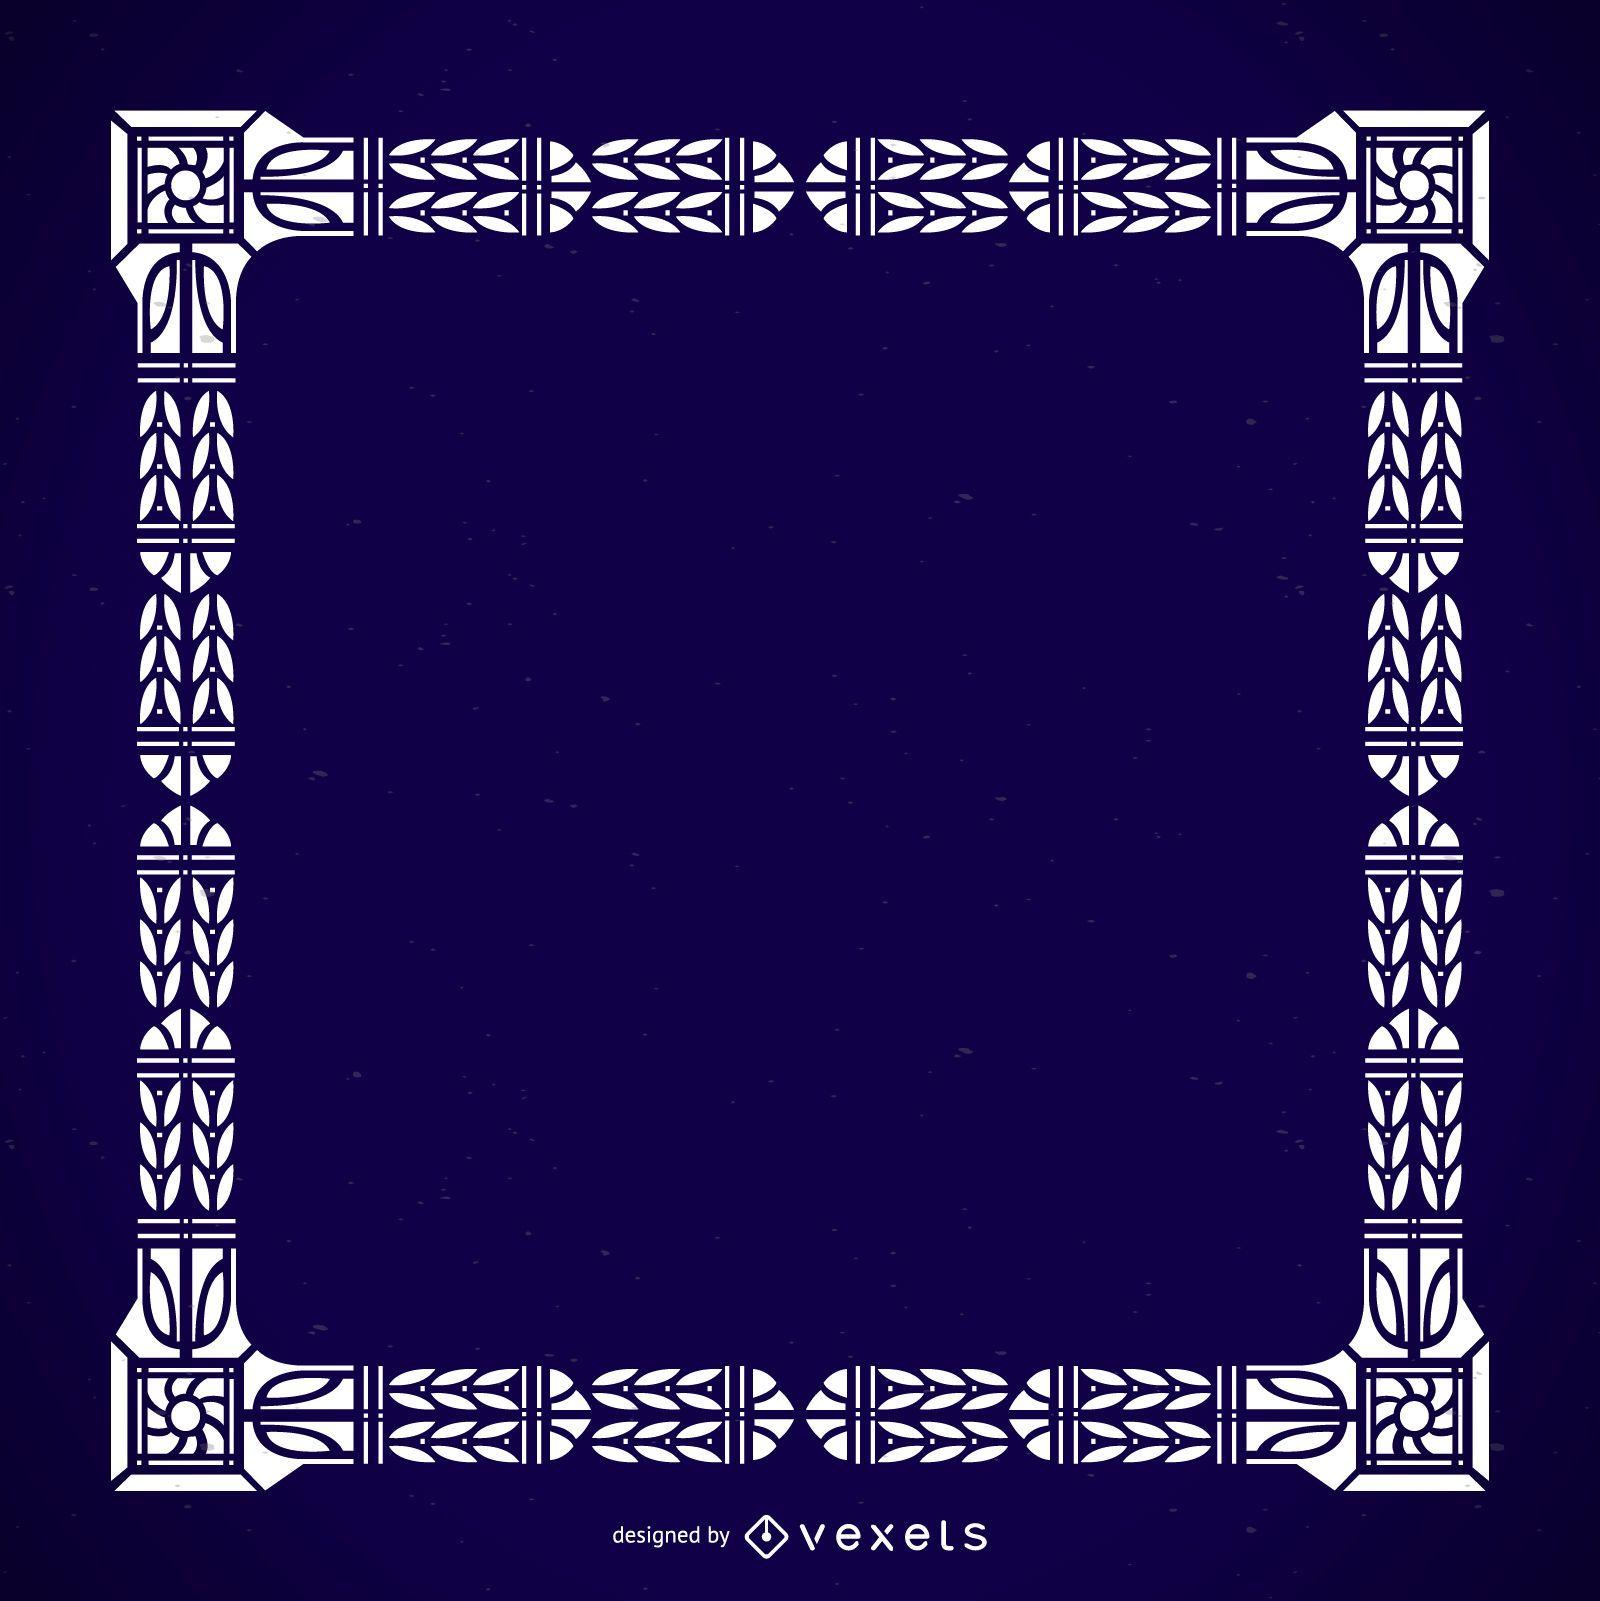 Detailed massive ornamental frame